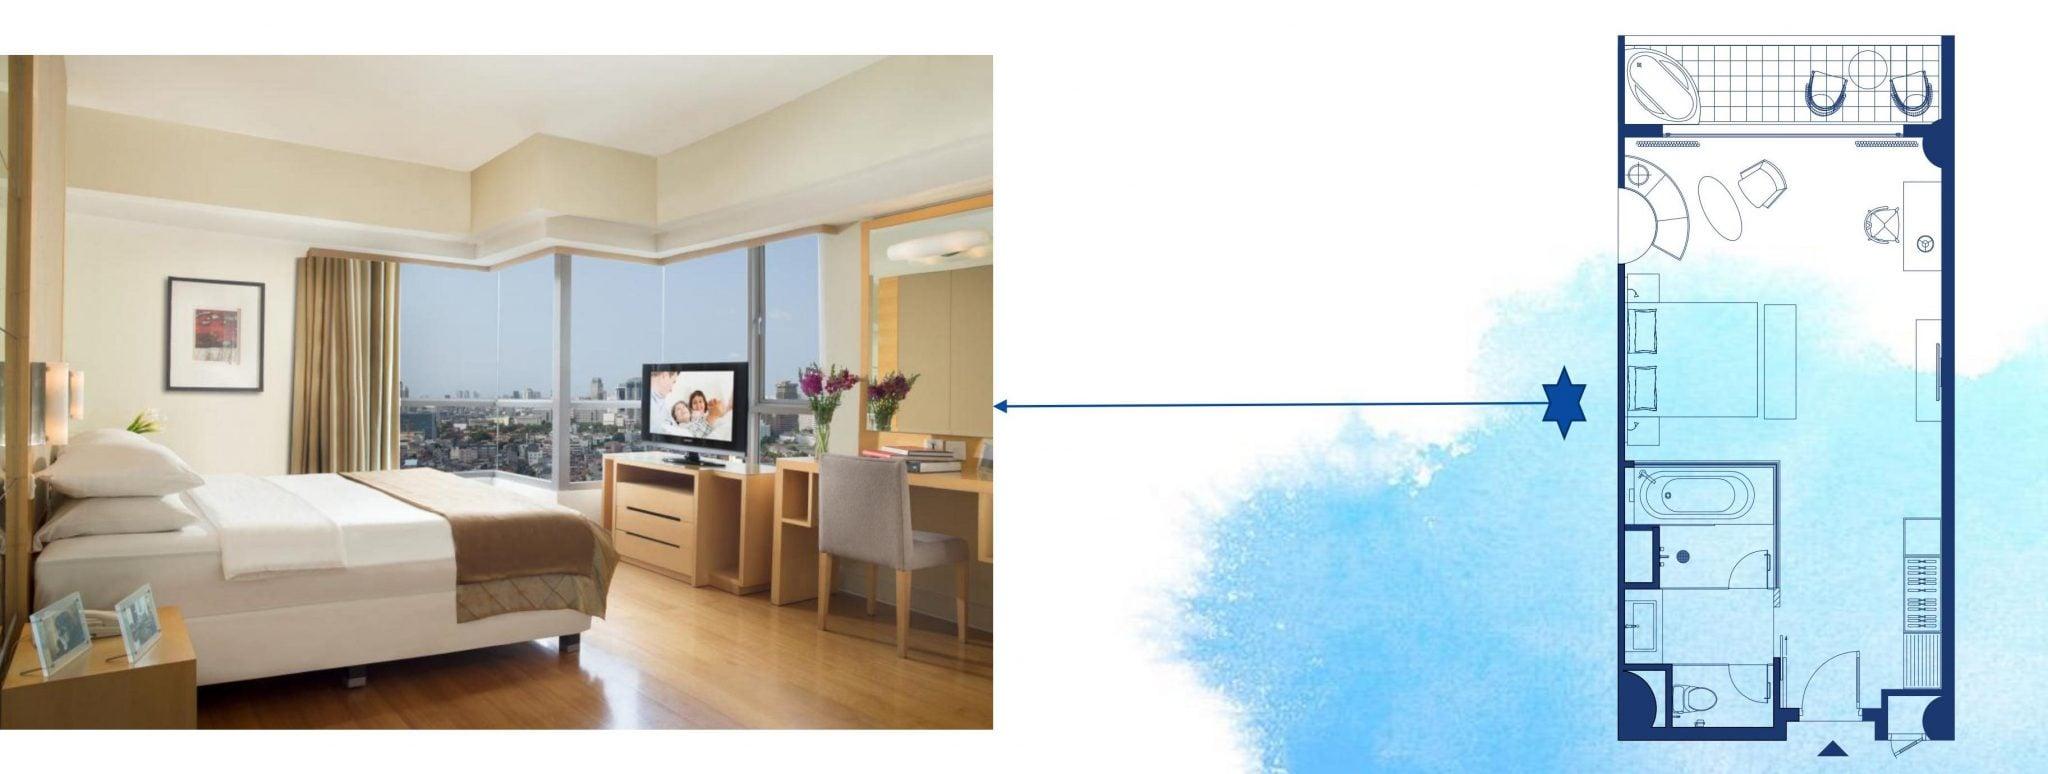 0049 e1563265789628 - Dự án căn hộ condotel Cam Ranh Bay - Pearl Cam Ranh